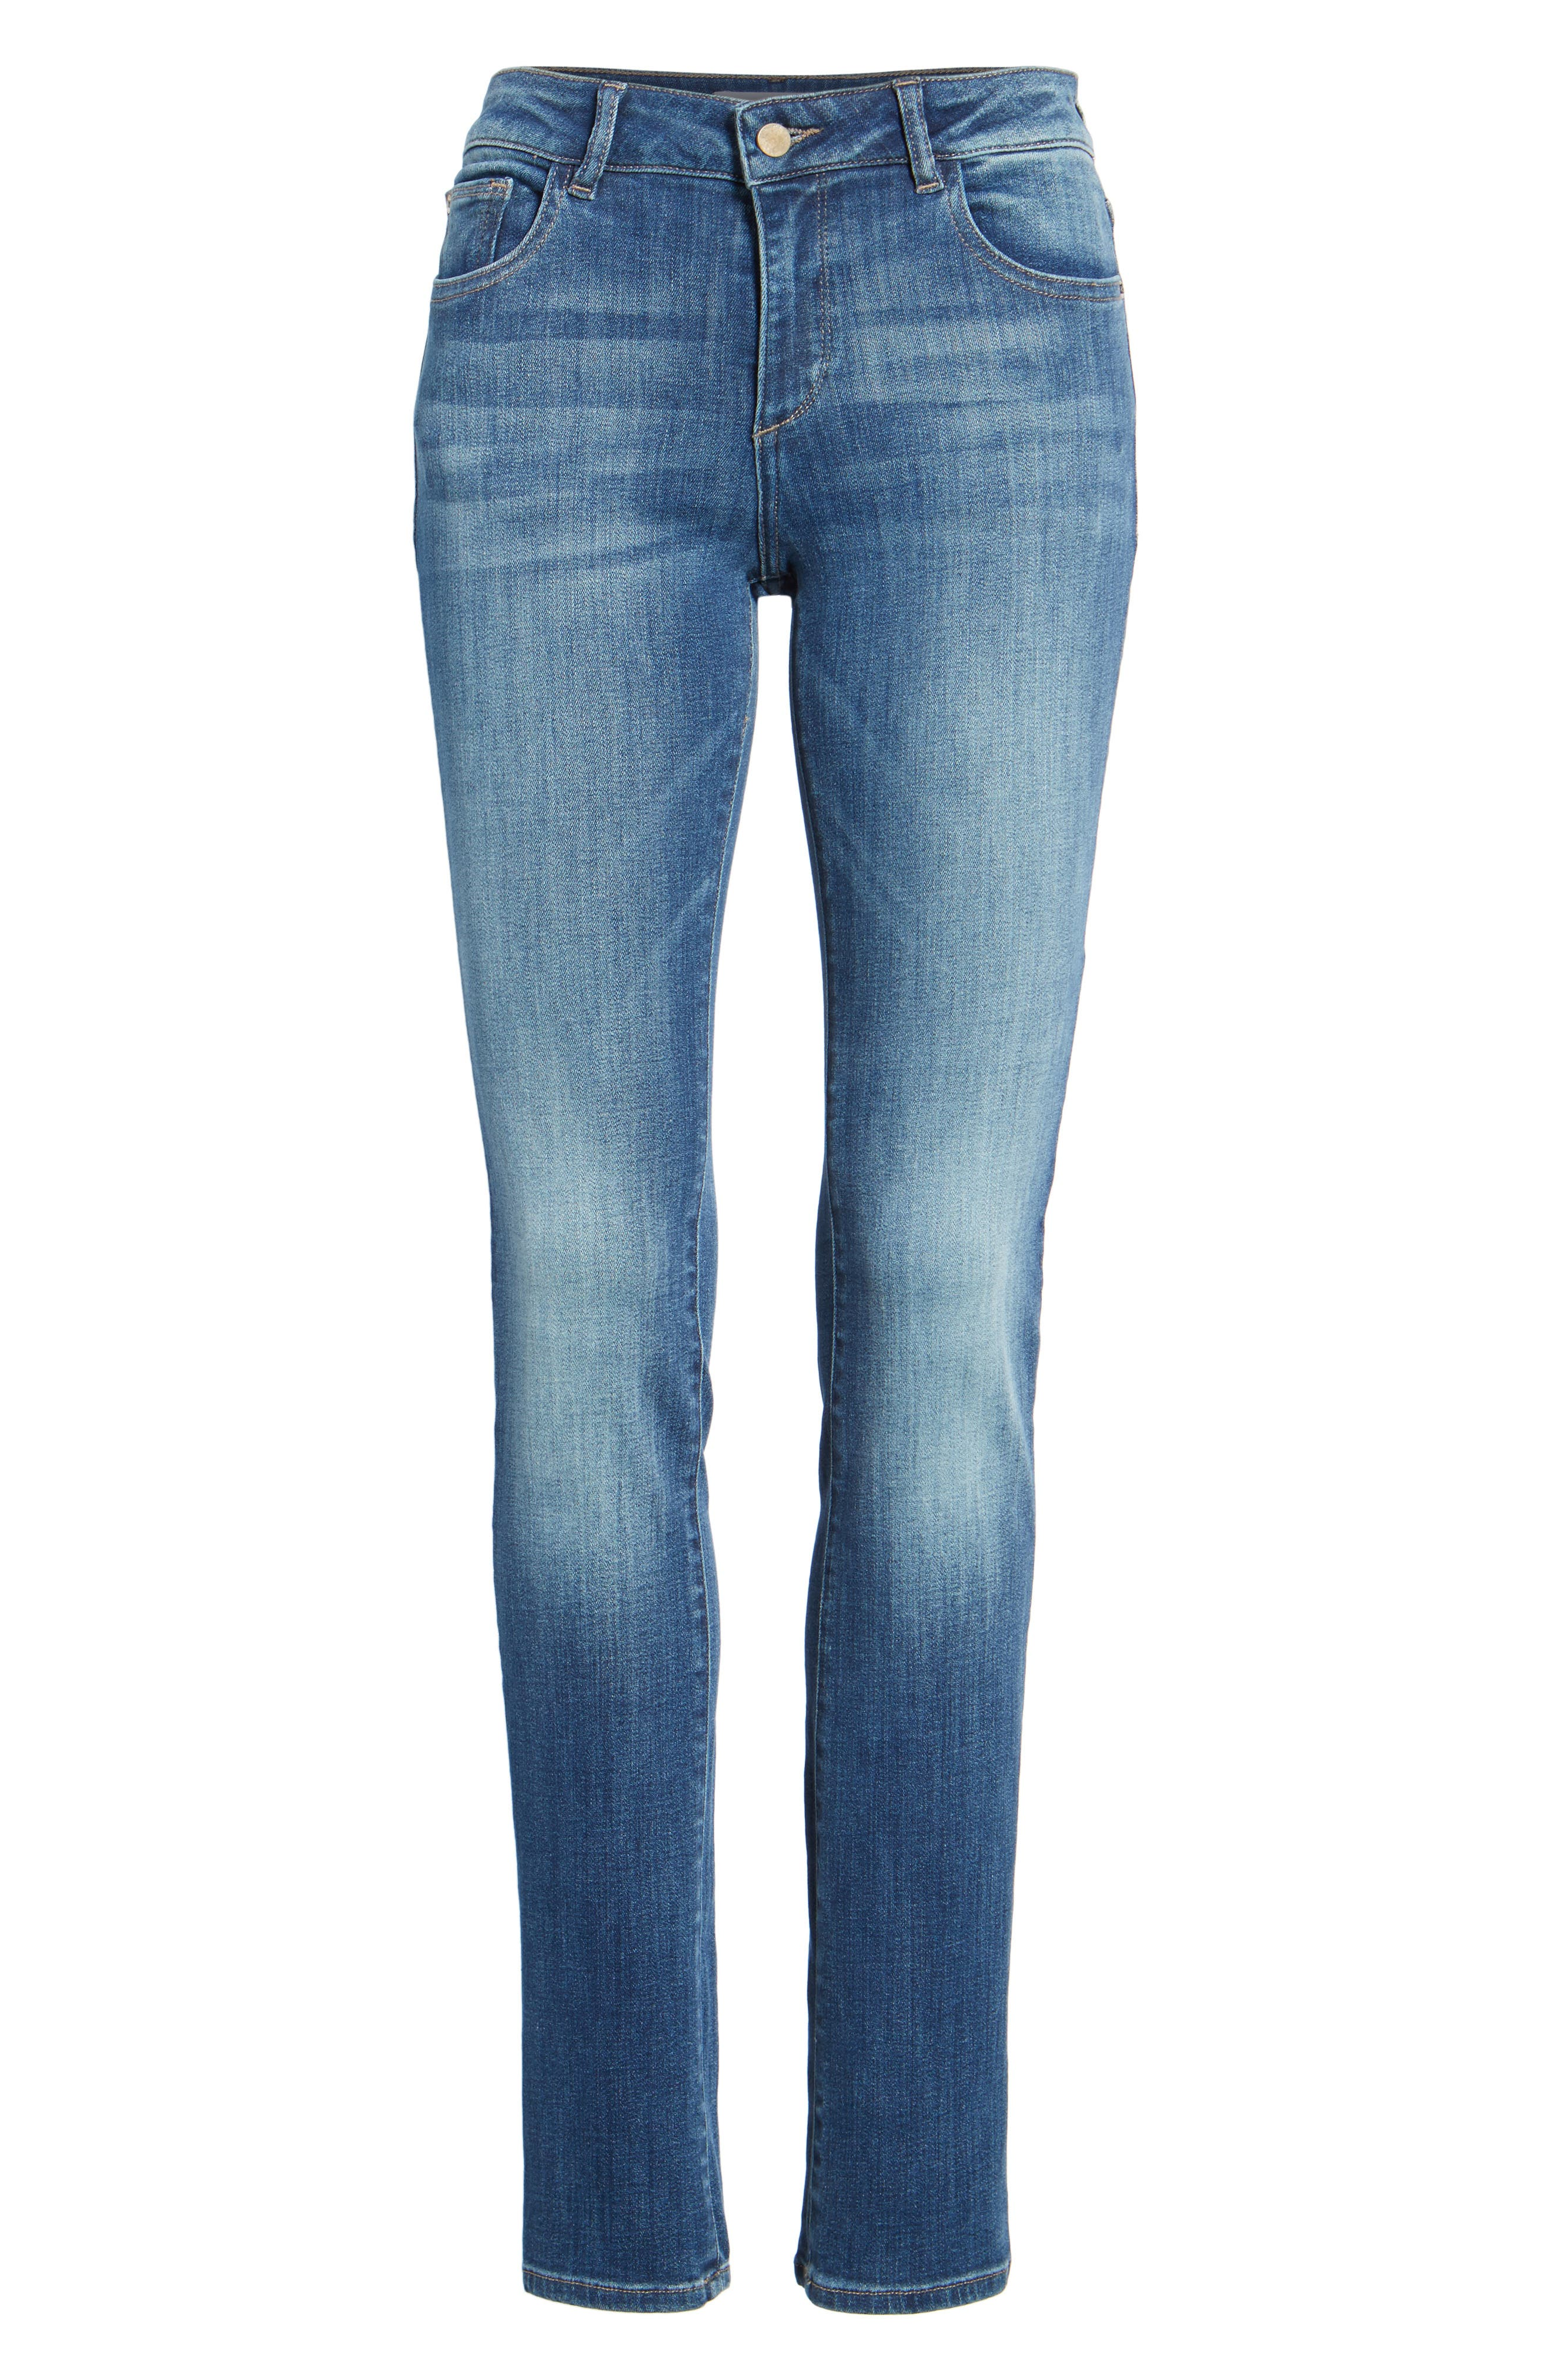 Mara Straight Leg Jeans,                             Alternate thumbnail 7, color,                             Spring Lake